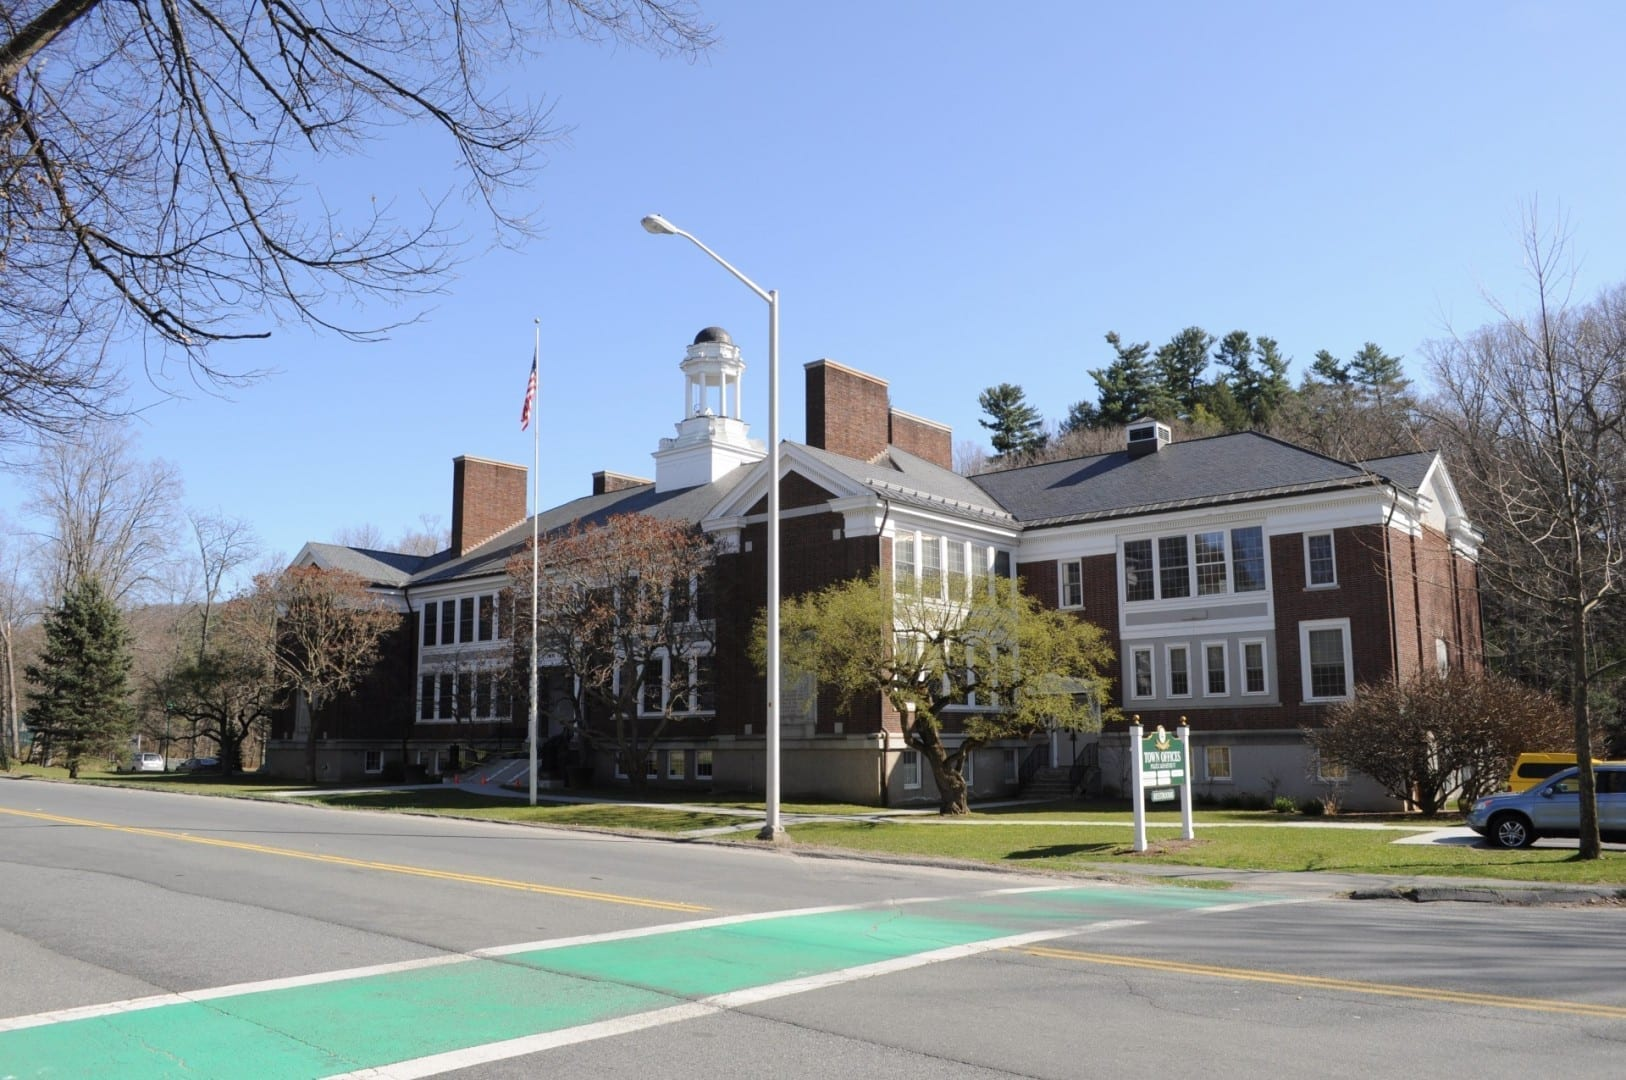 Las oficinas de la ciudad de Stockbridge Stockbridge MA Estados Unidos